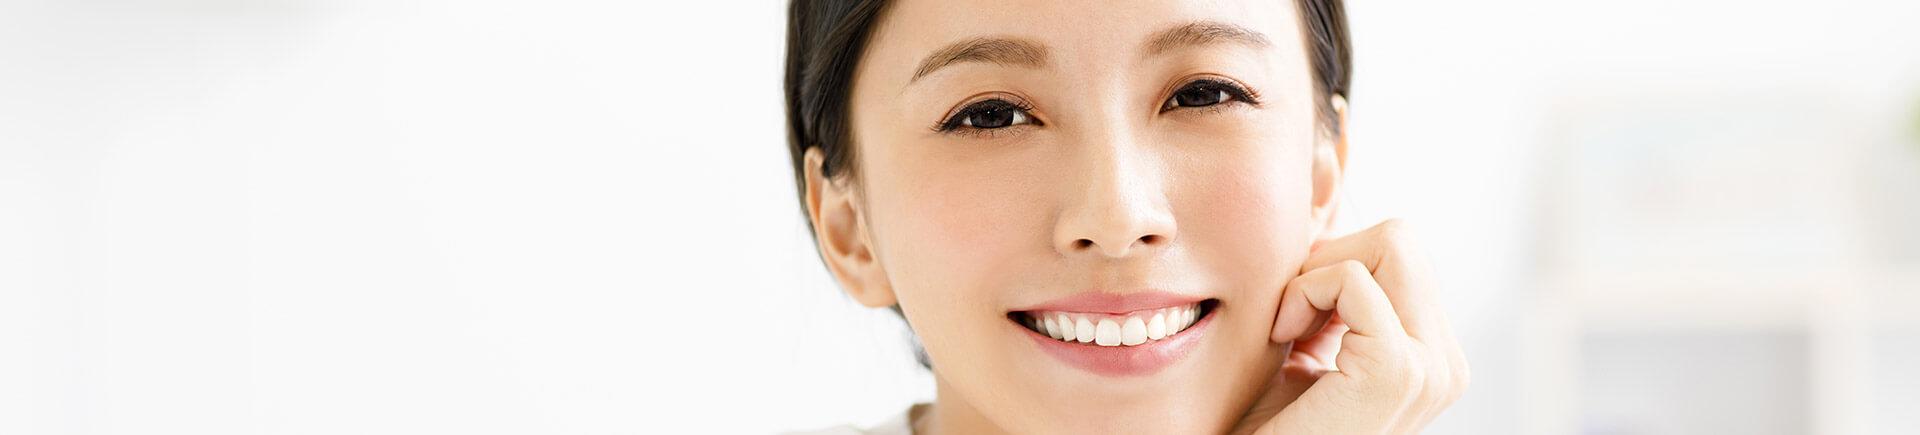 Dental Inlays & Onlays